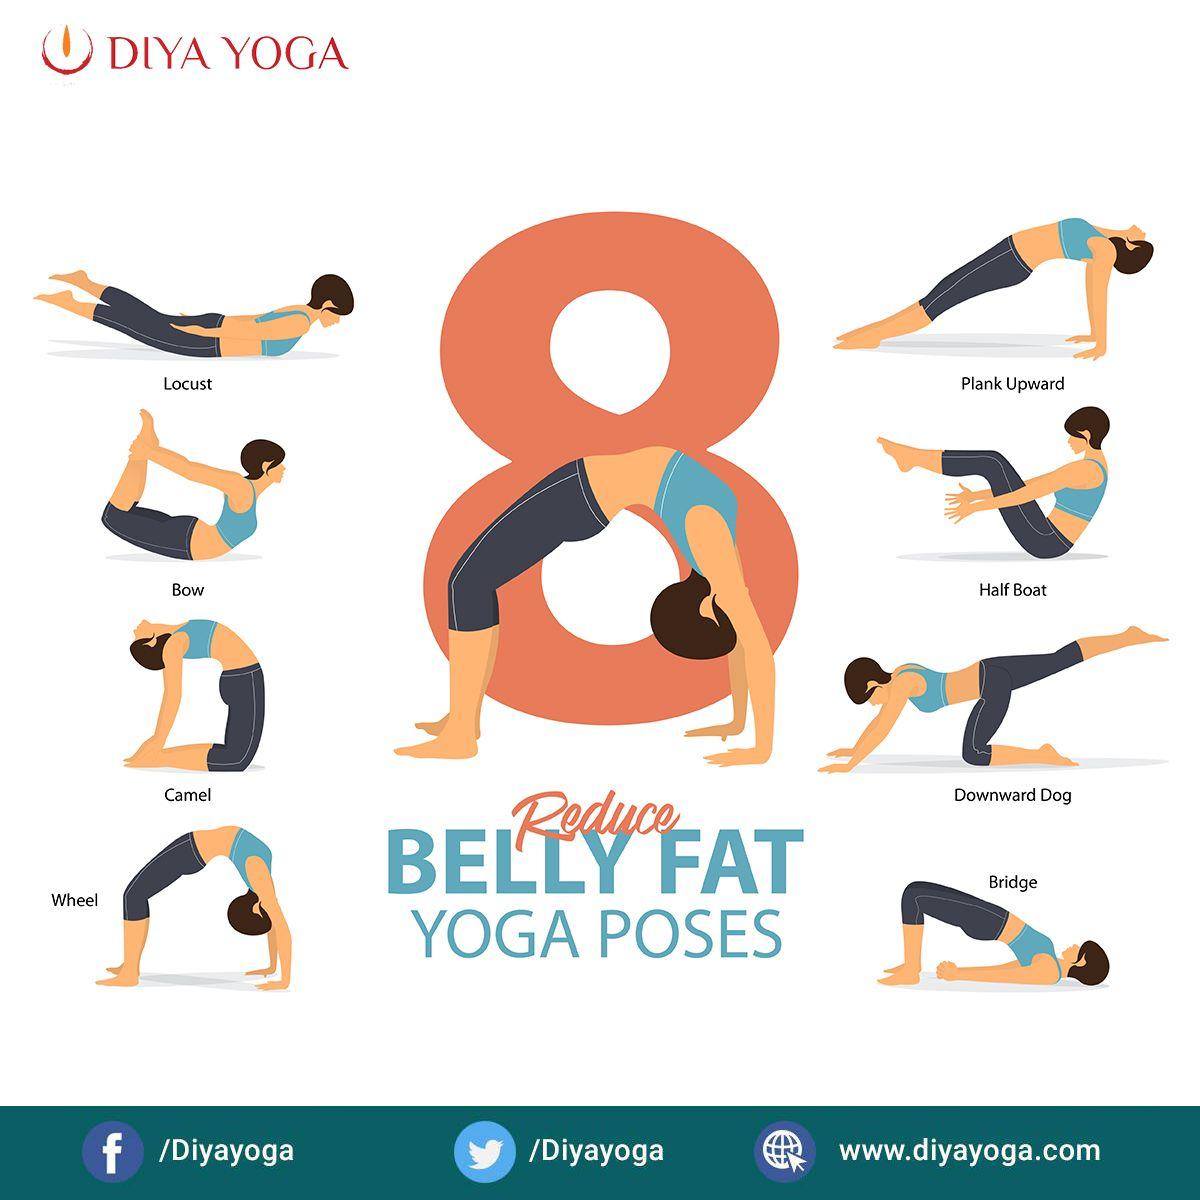 14+ Yoga poses to lose tummy fat ideas in 2021